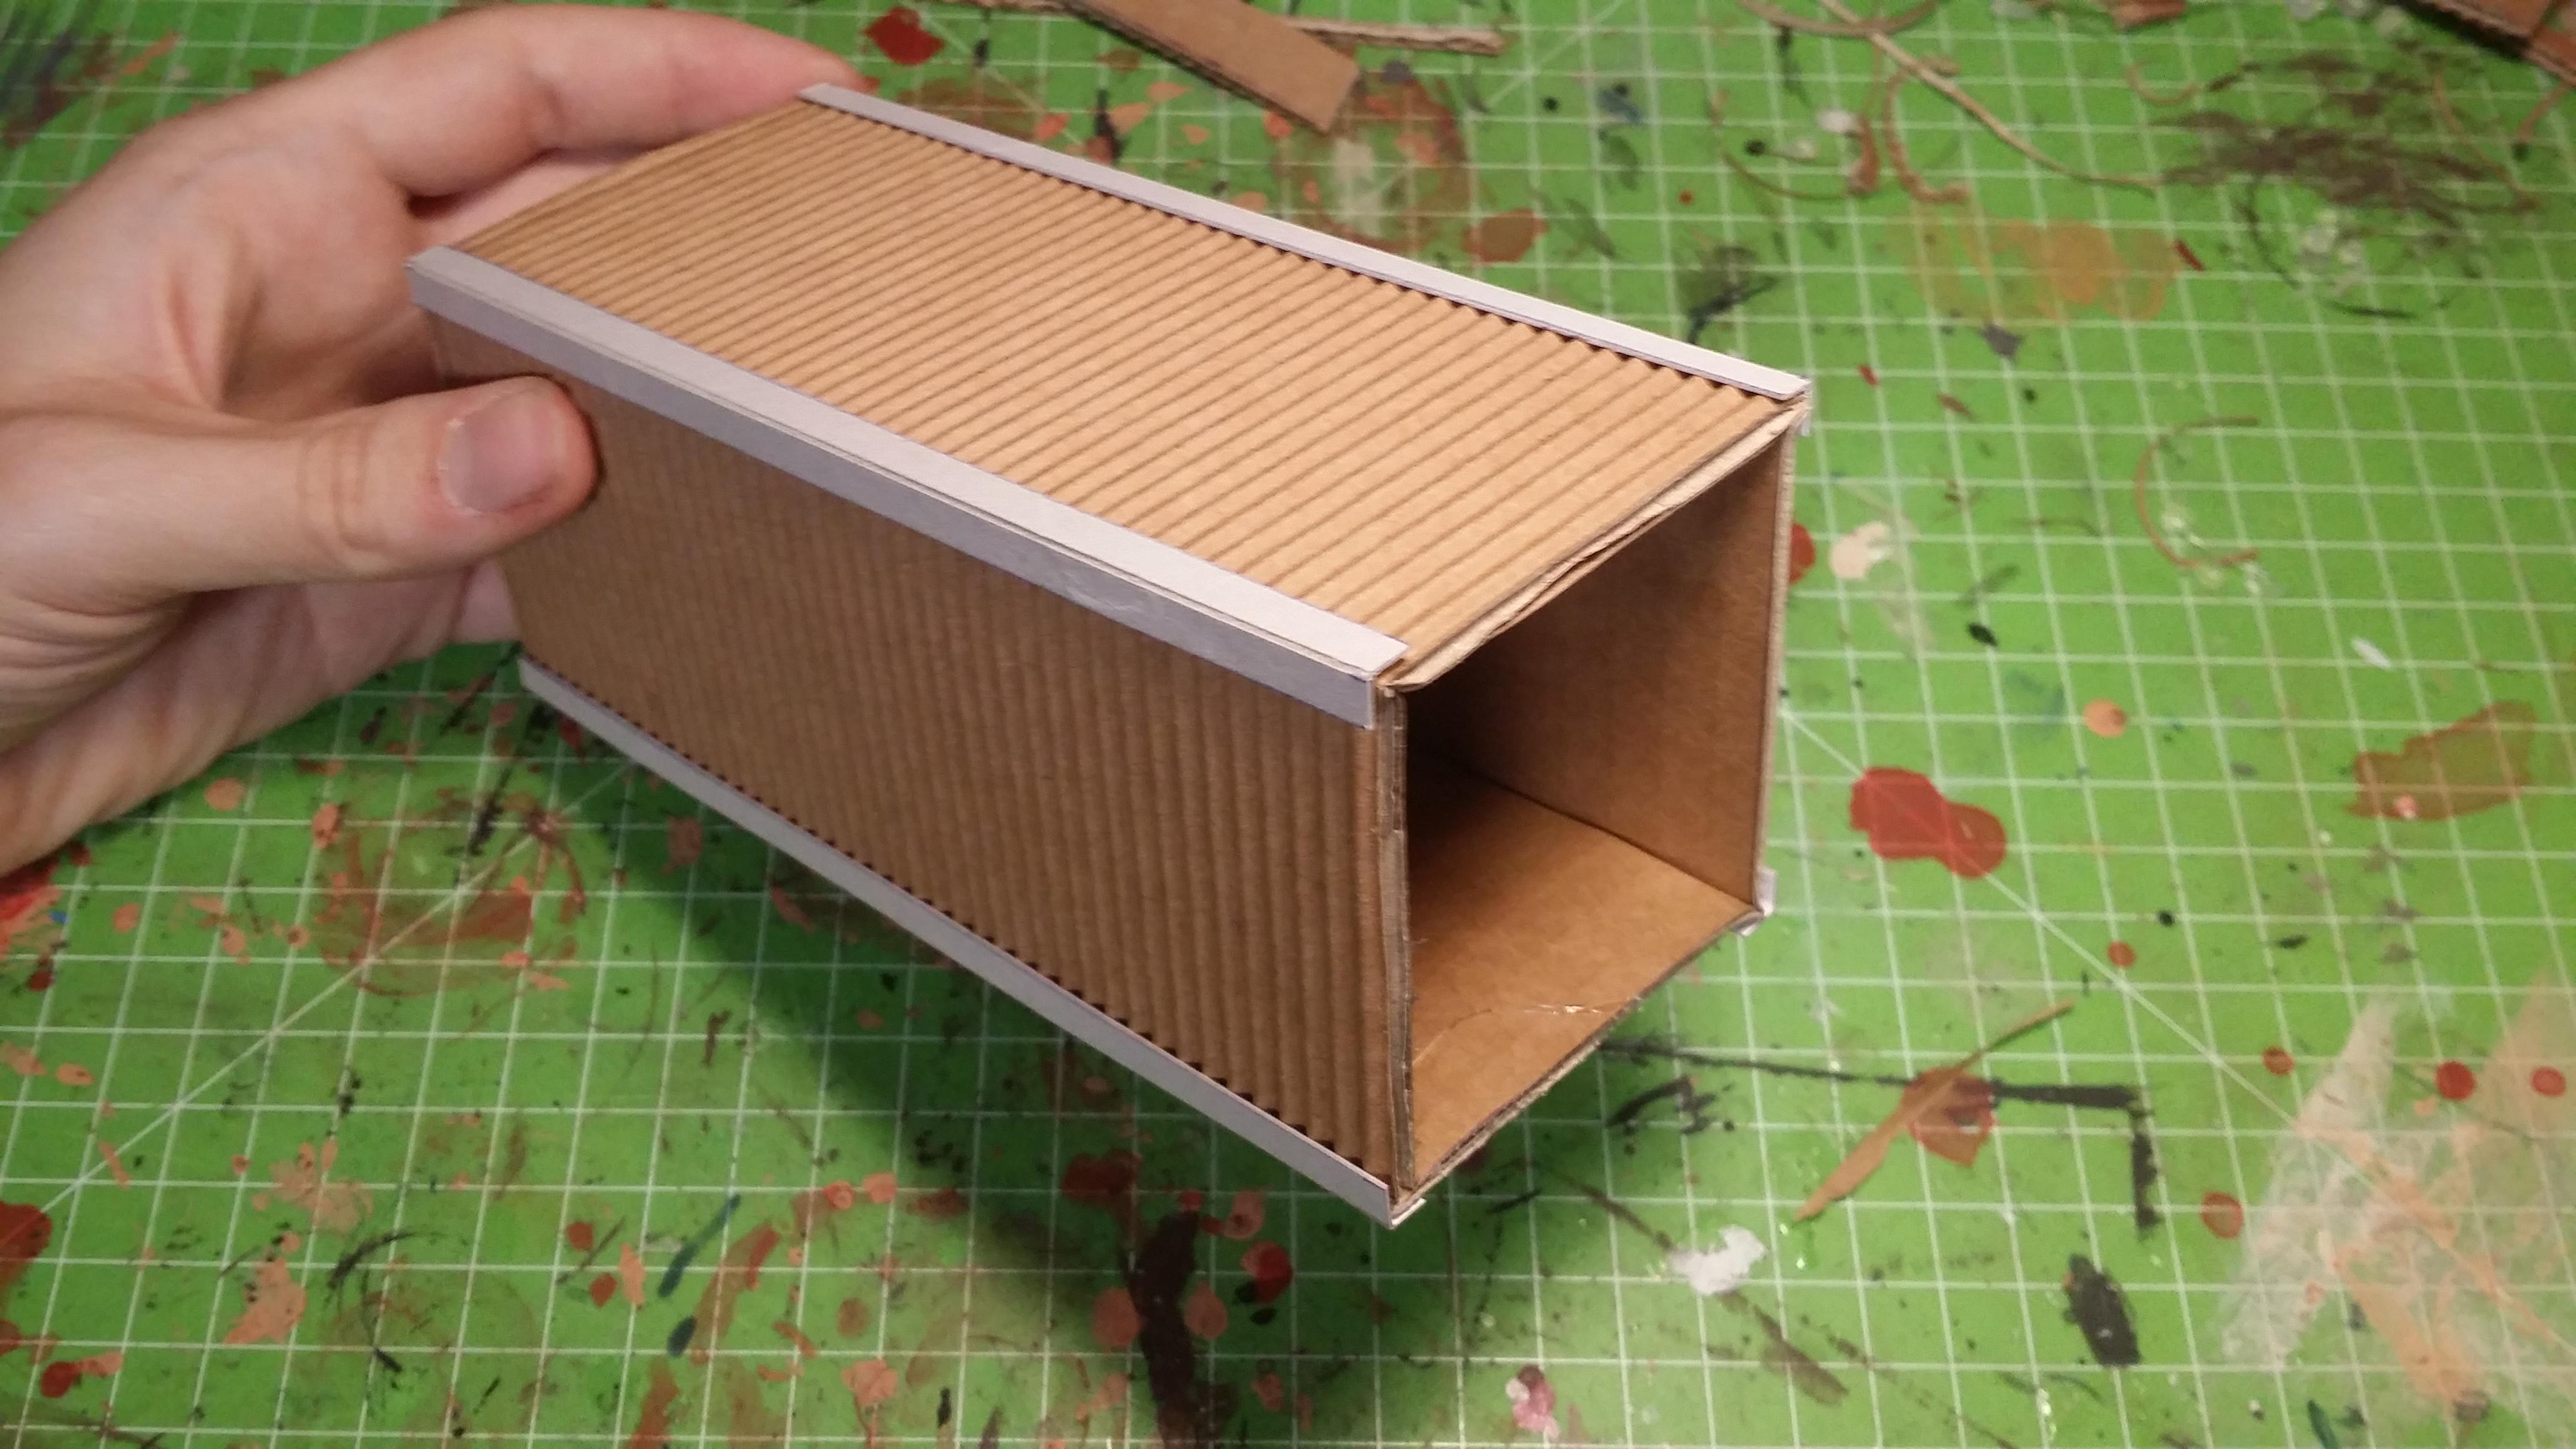 Built, Container, Custom, Freight, Scratch, Shipping, Terrain, Tutorial